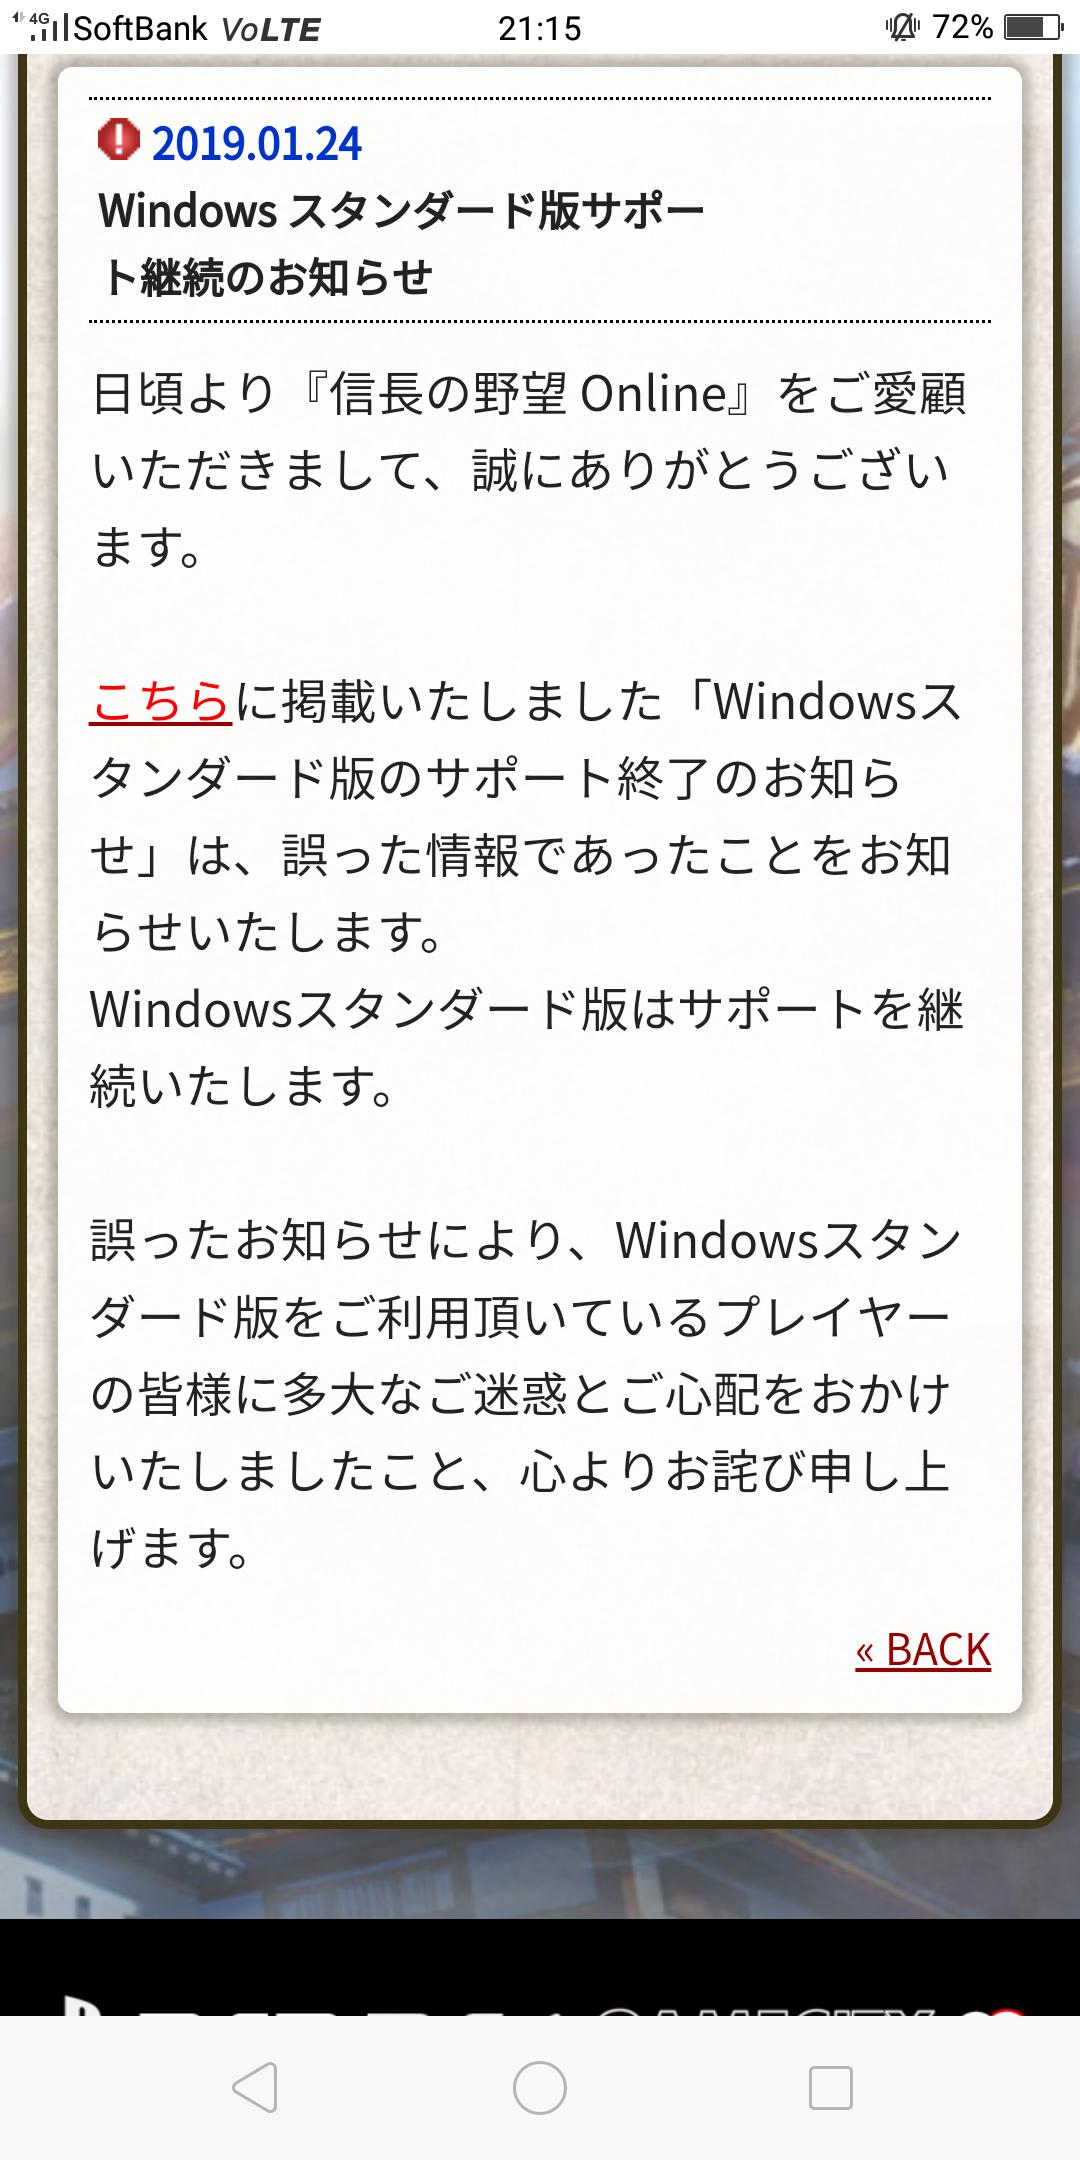 Screenshot_2019-01-24-21-15-20-51